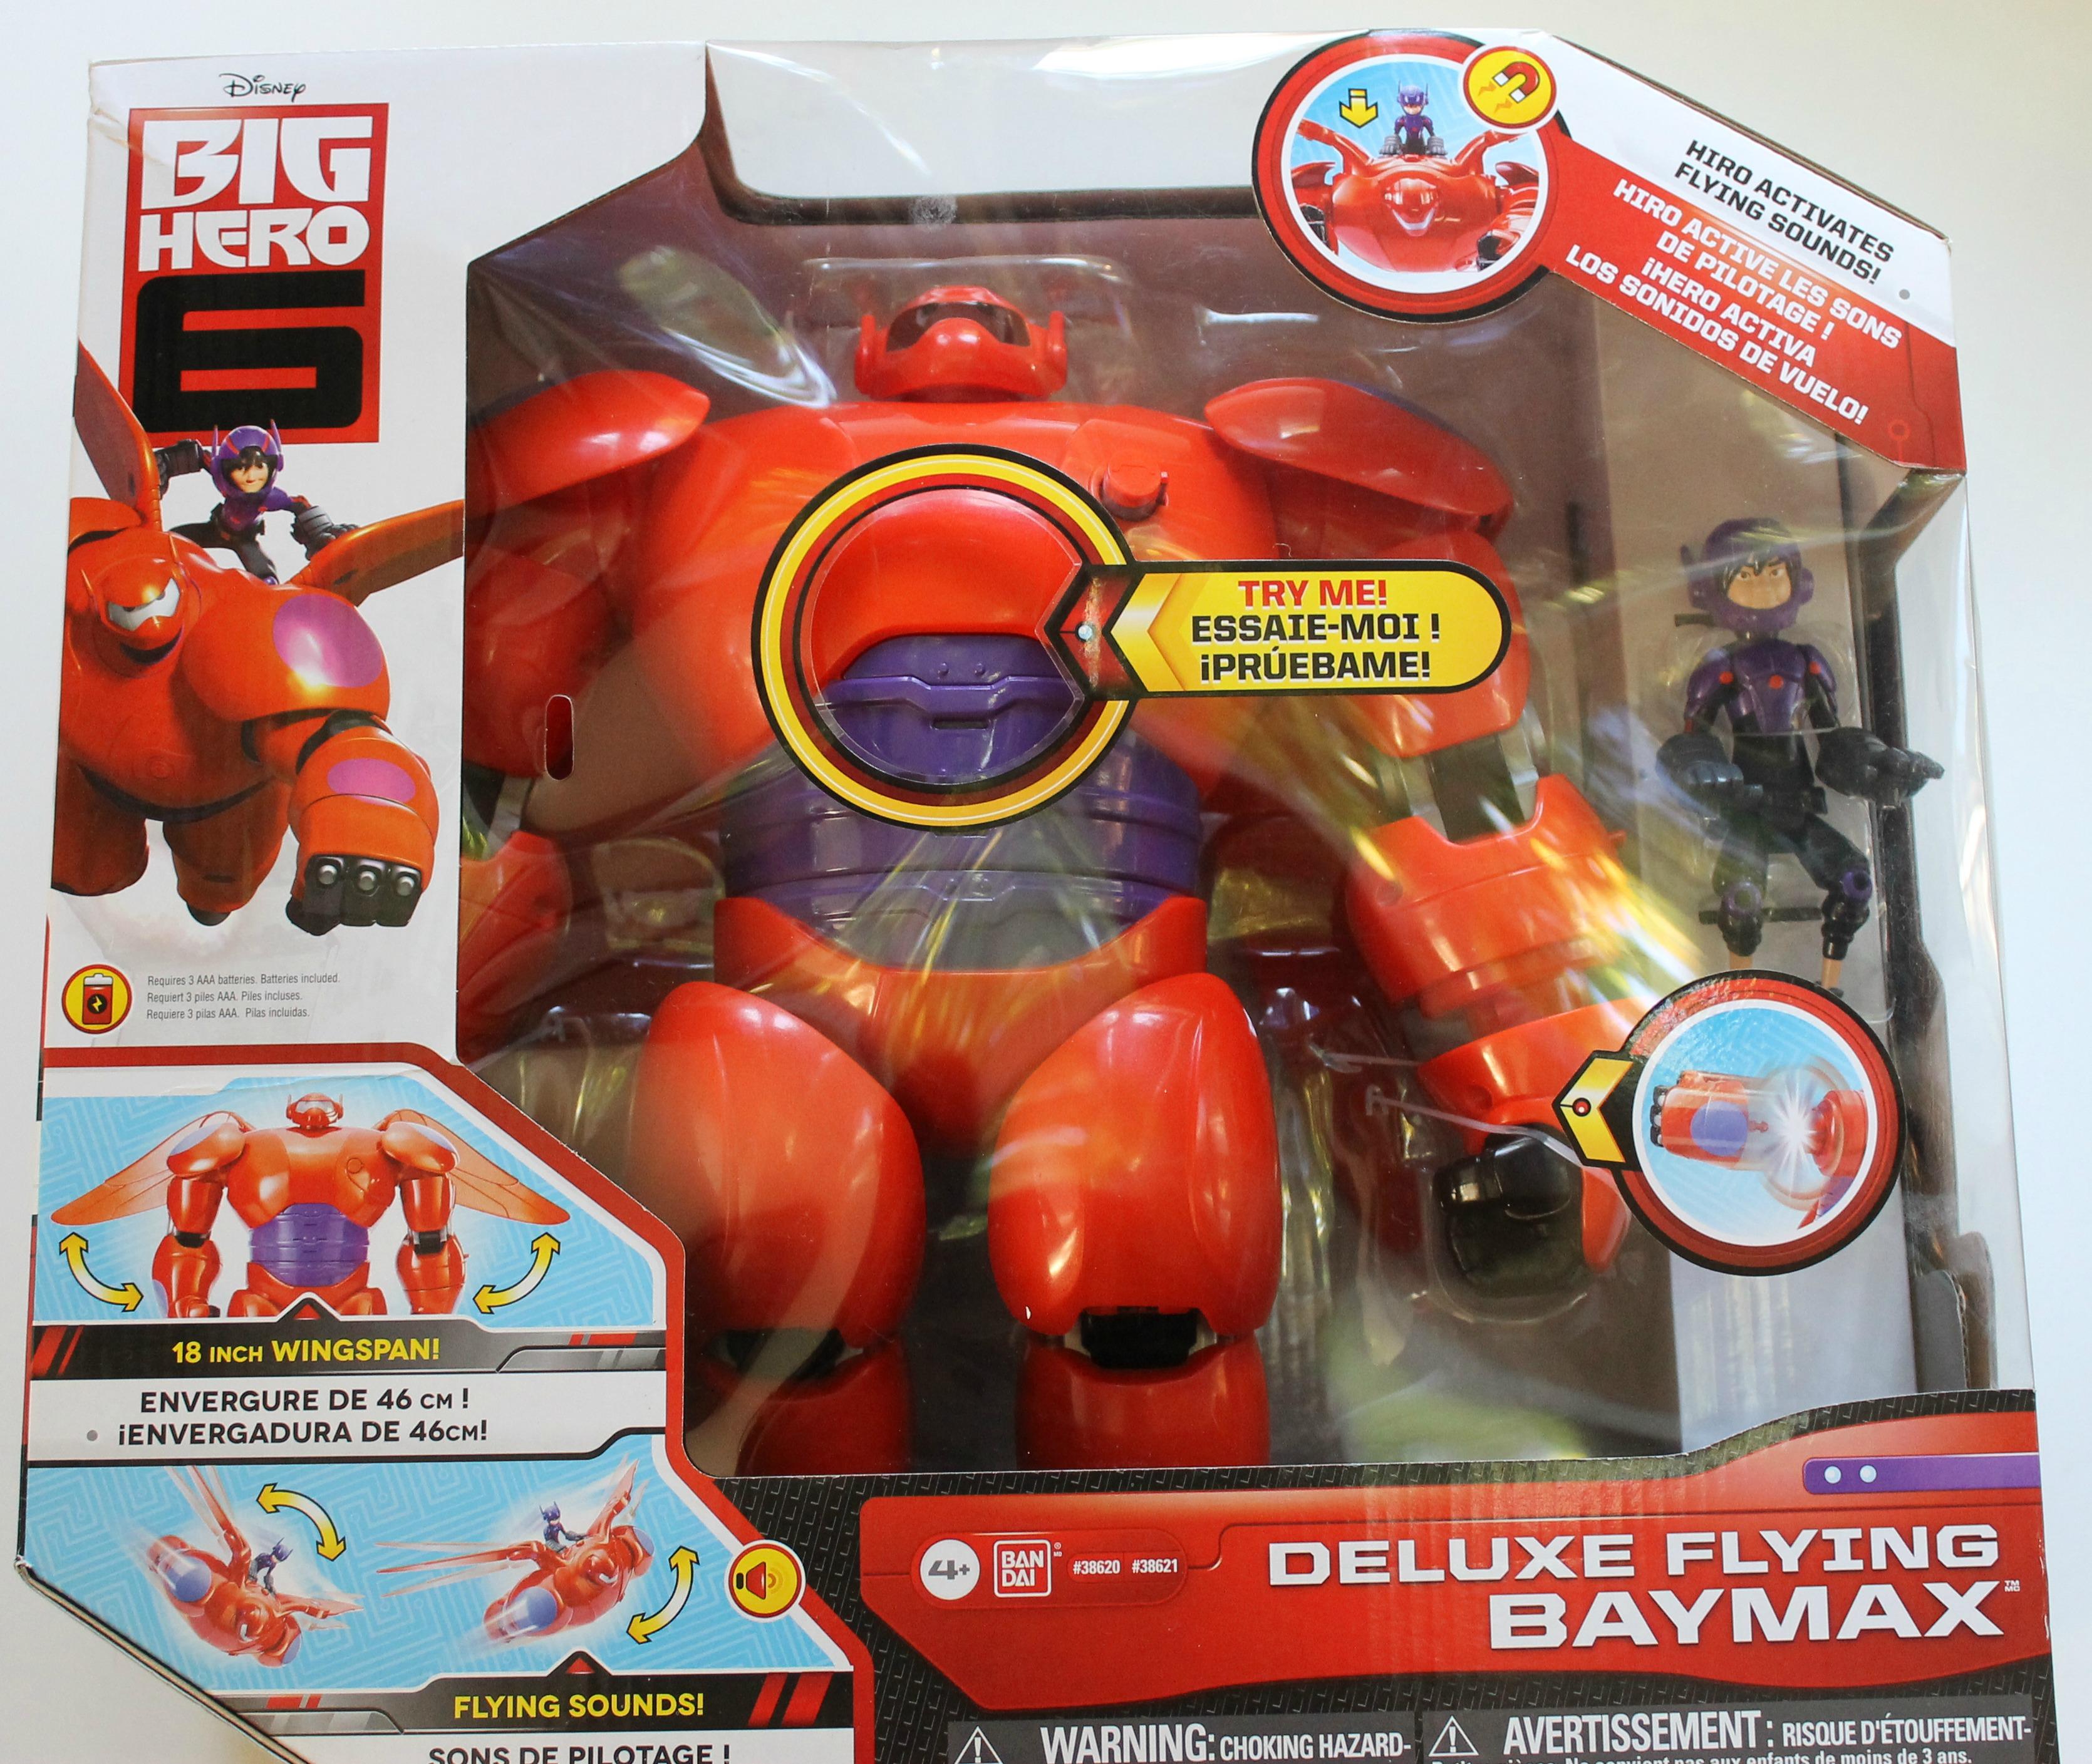 Deluxe-Flying-Baymax-Big-Hero-6